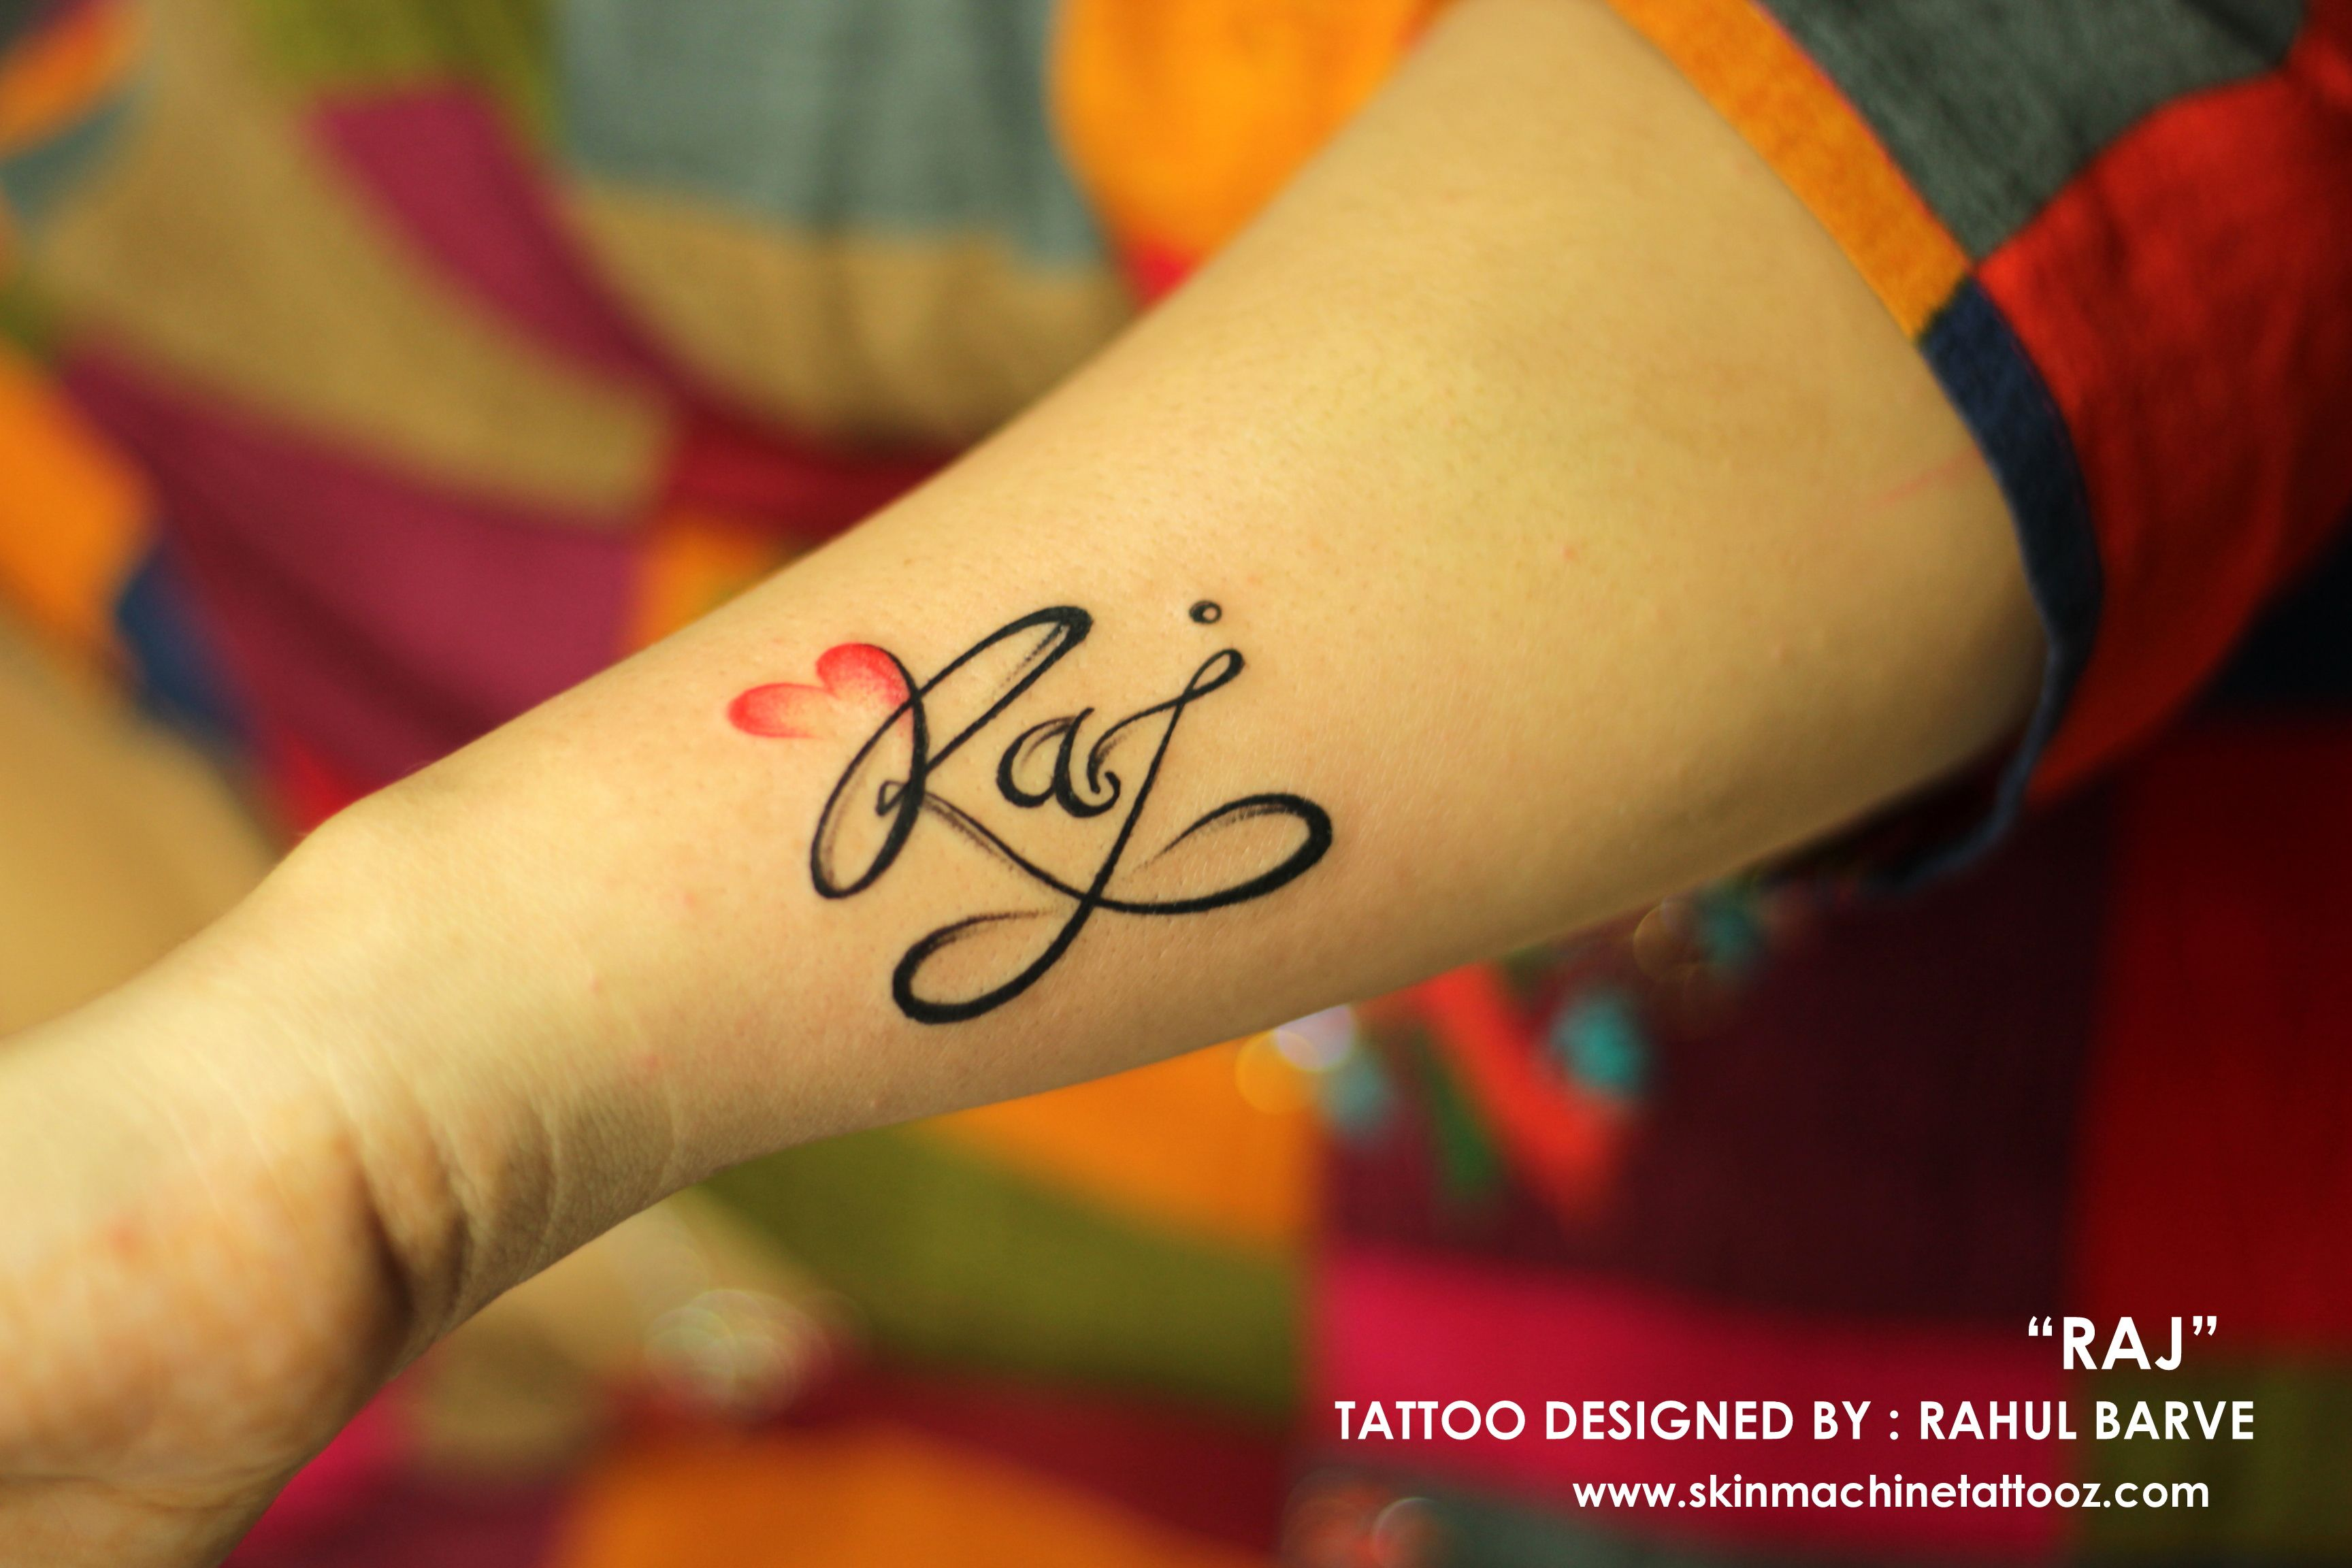 Hand Dj Name Tattoo Designs